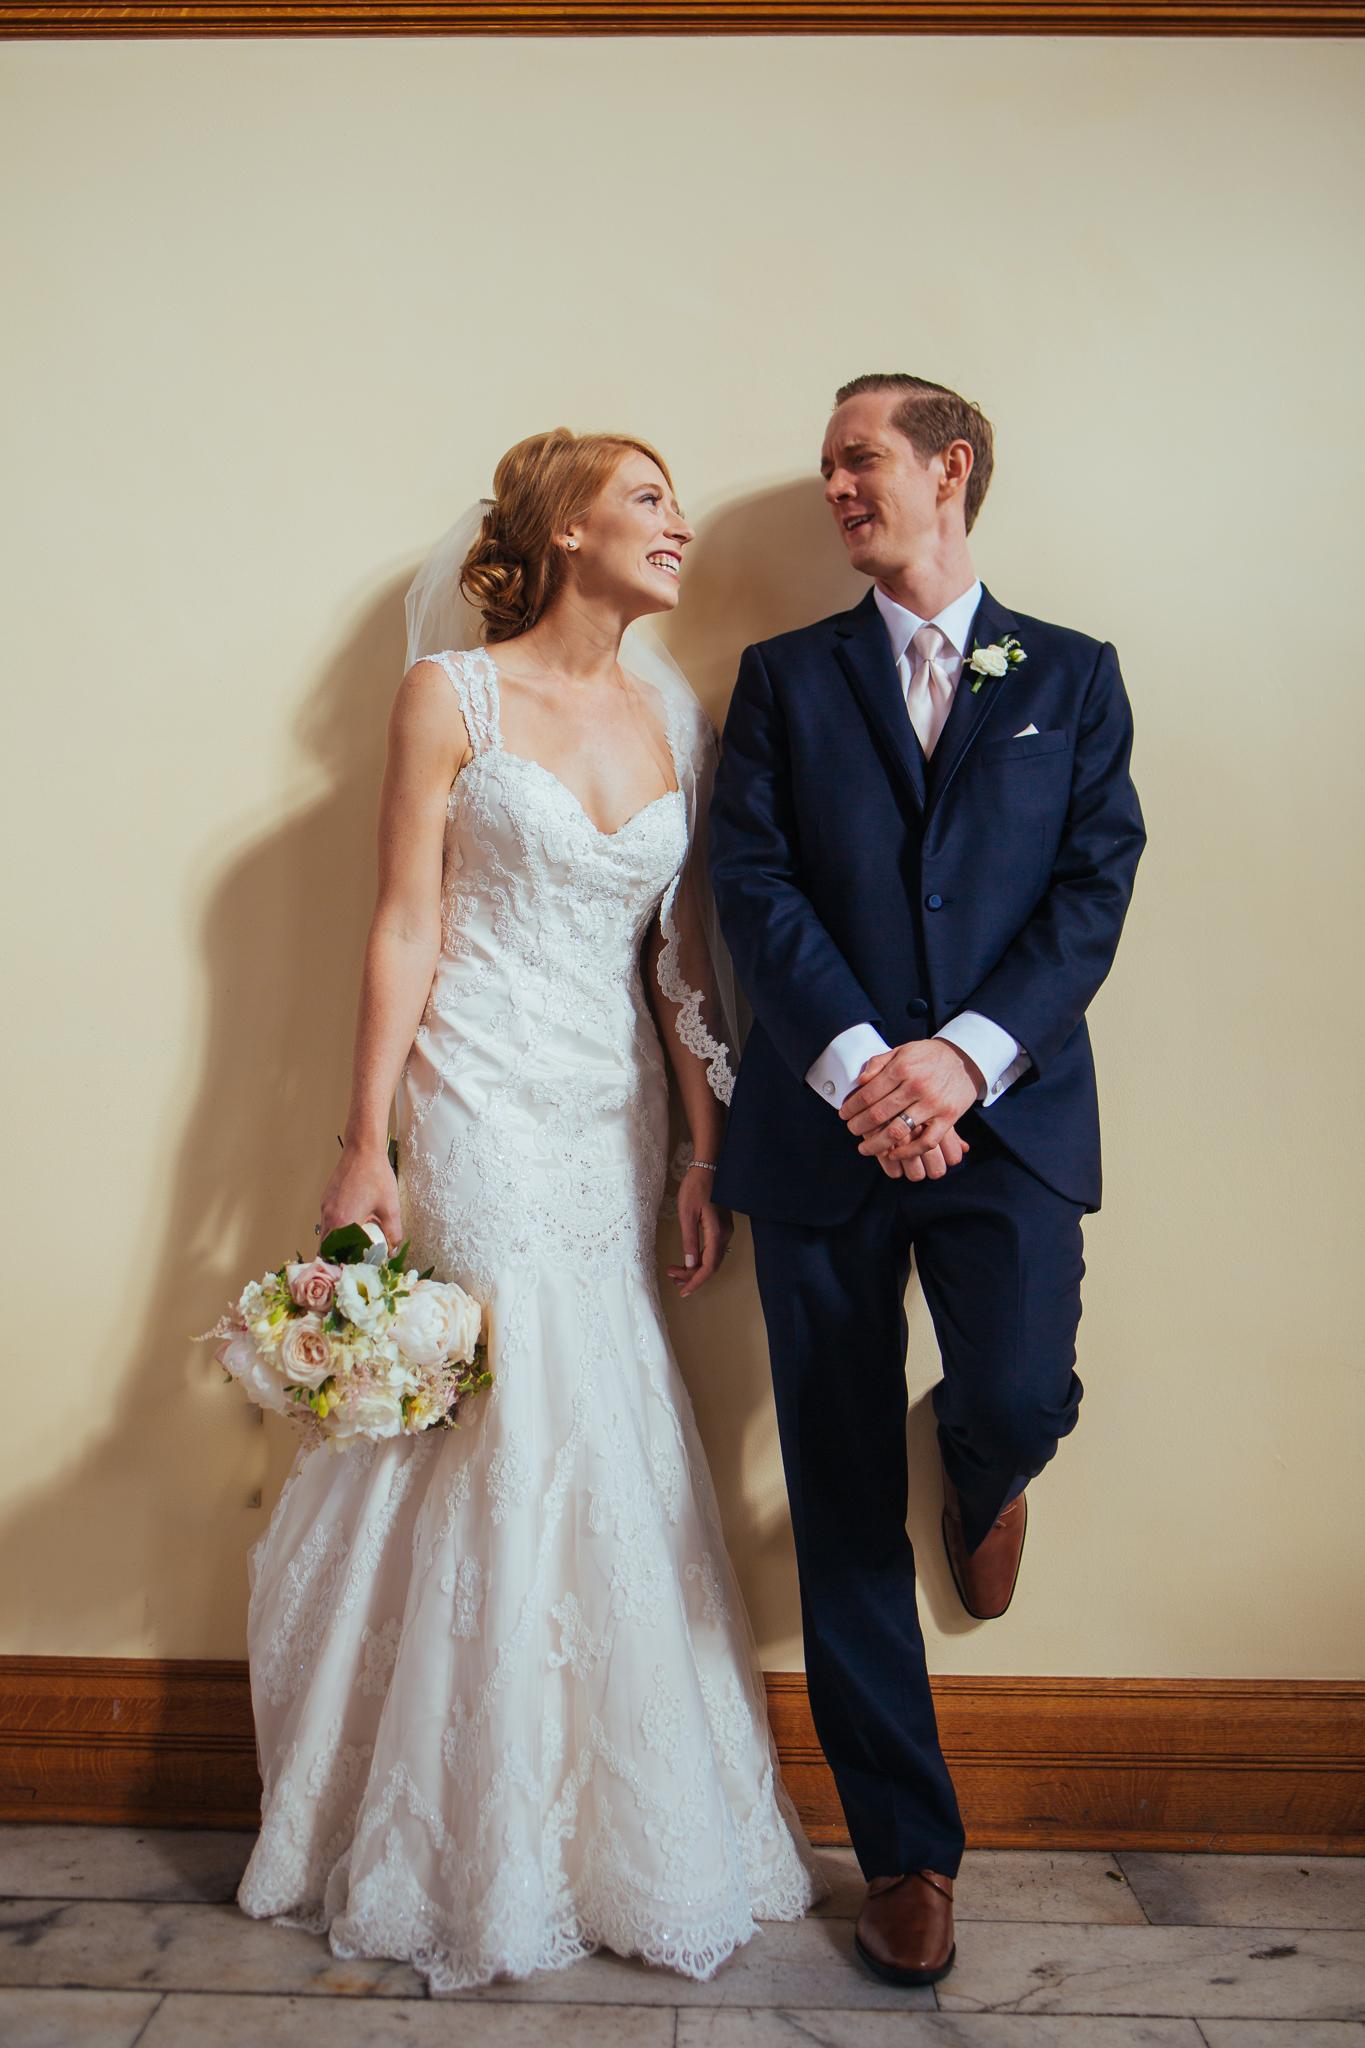 Michael and Kelly - the ashton depot - wedding DFW - wedding photographer- elizalde photography (69 of 150).jpg